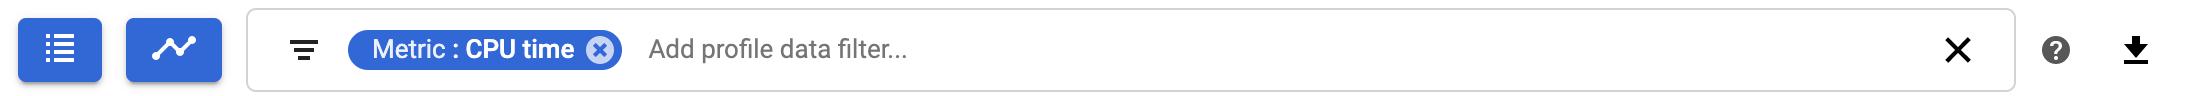 Profiler filter bar